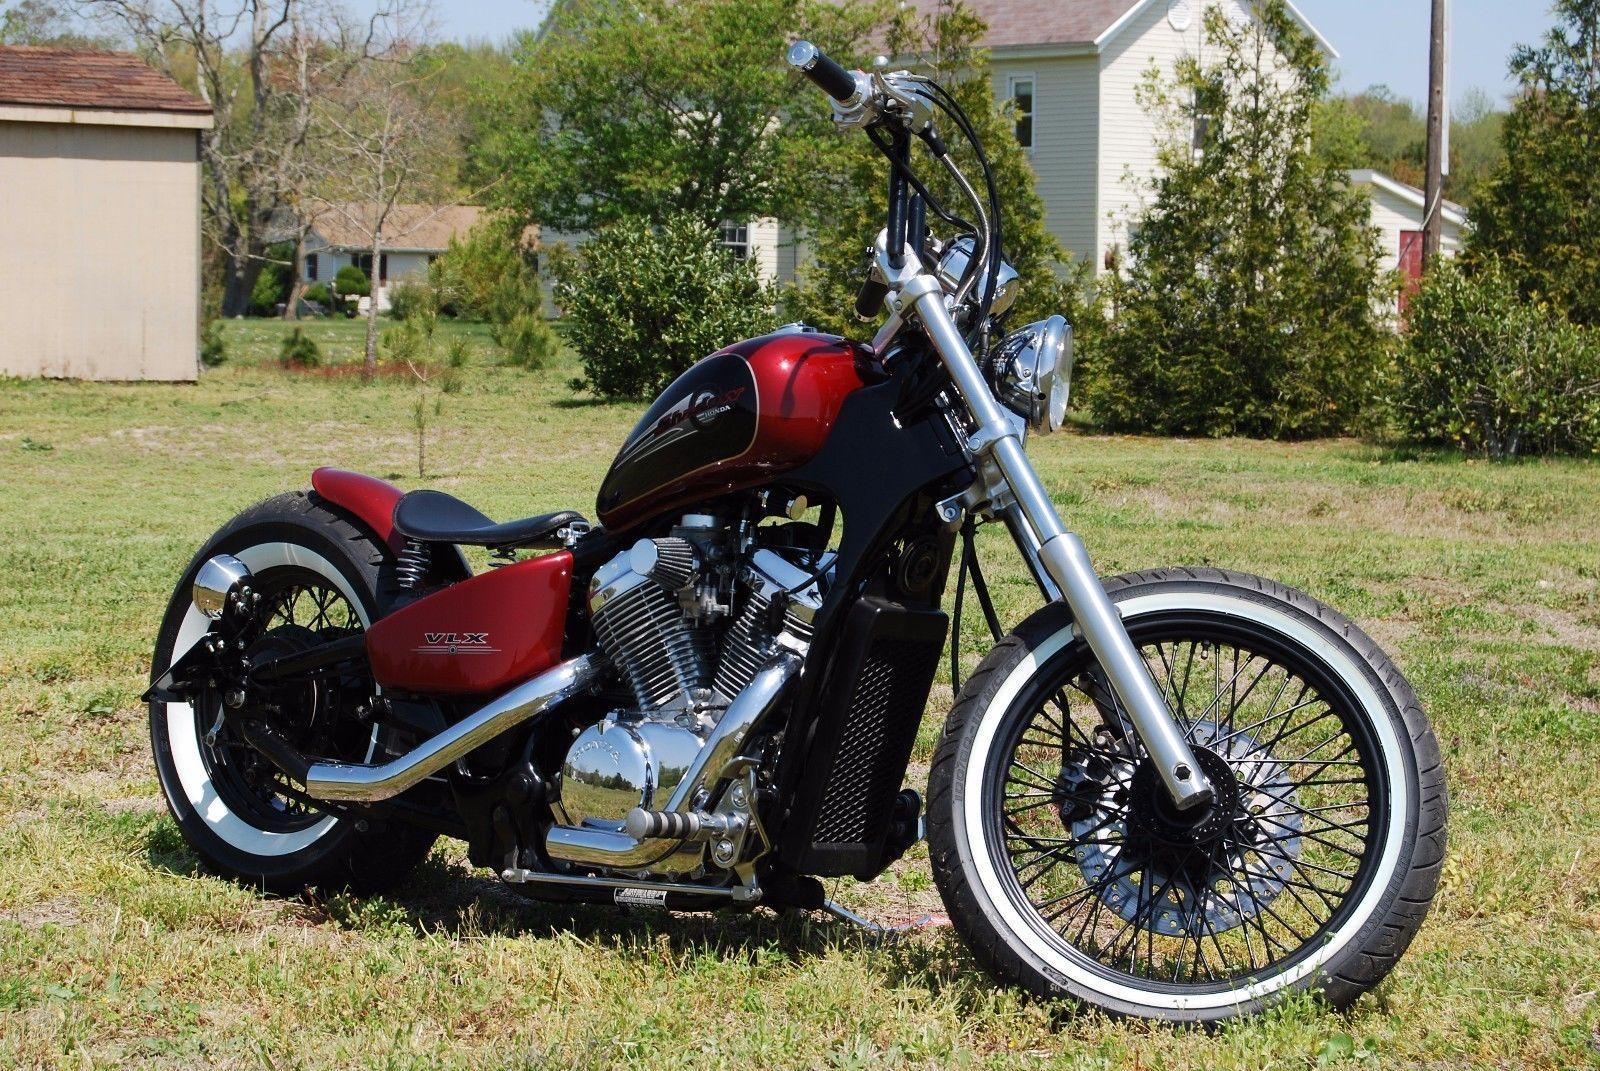 details about how to build custom bobber motorcycle dvd. Black Bedroom Furniture Sets. Home Design Ideas